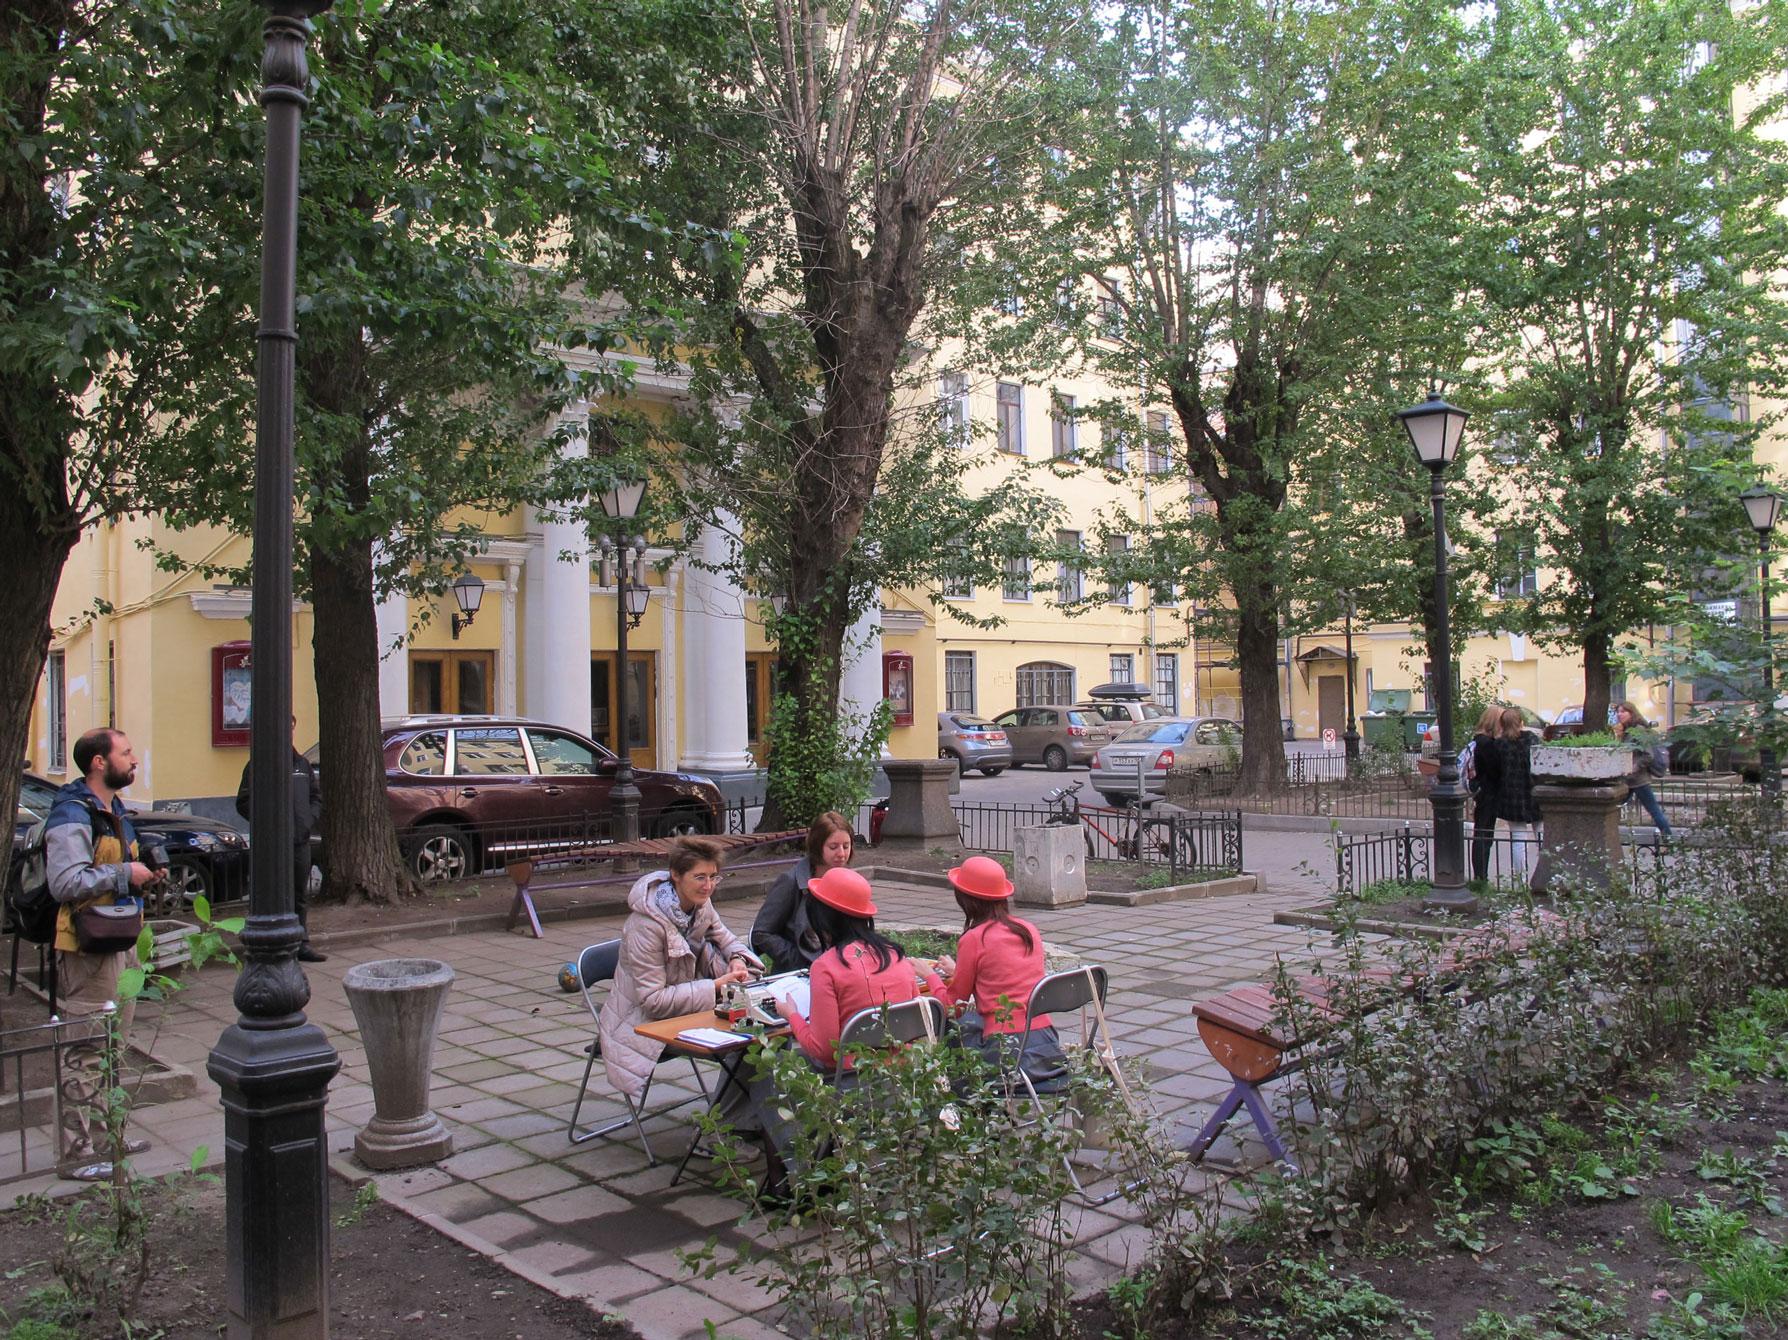 St. Peterburg, Russia